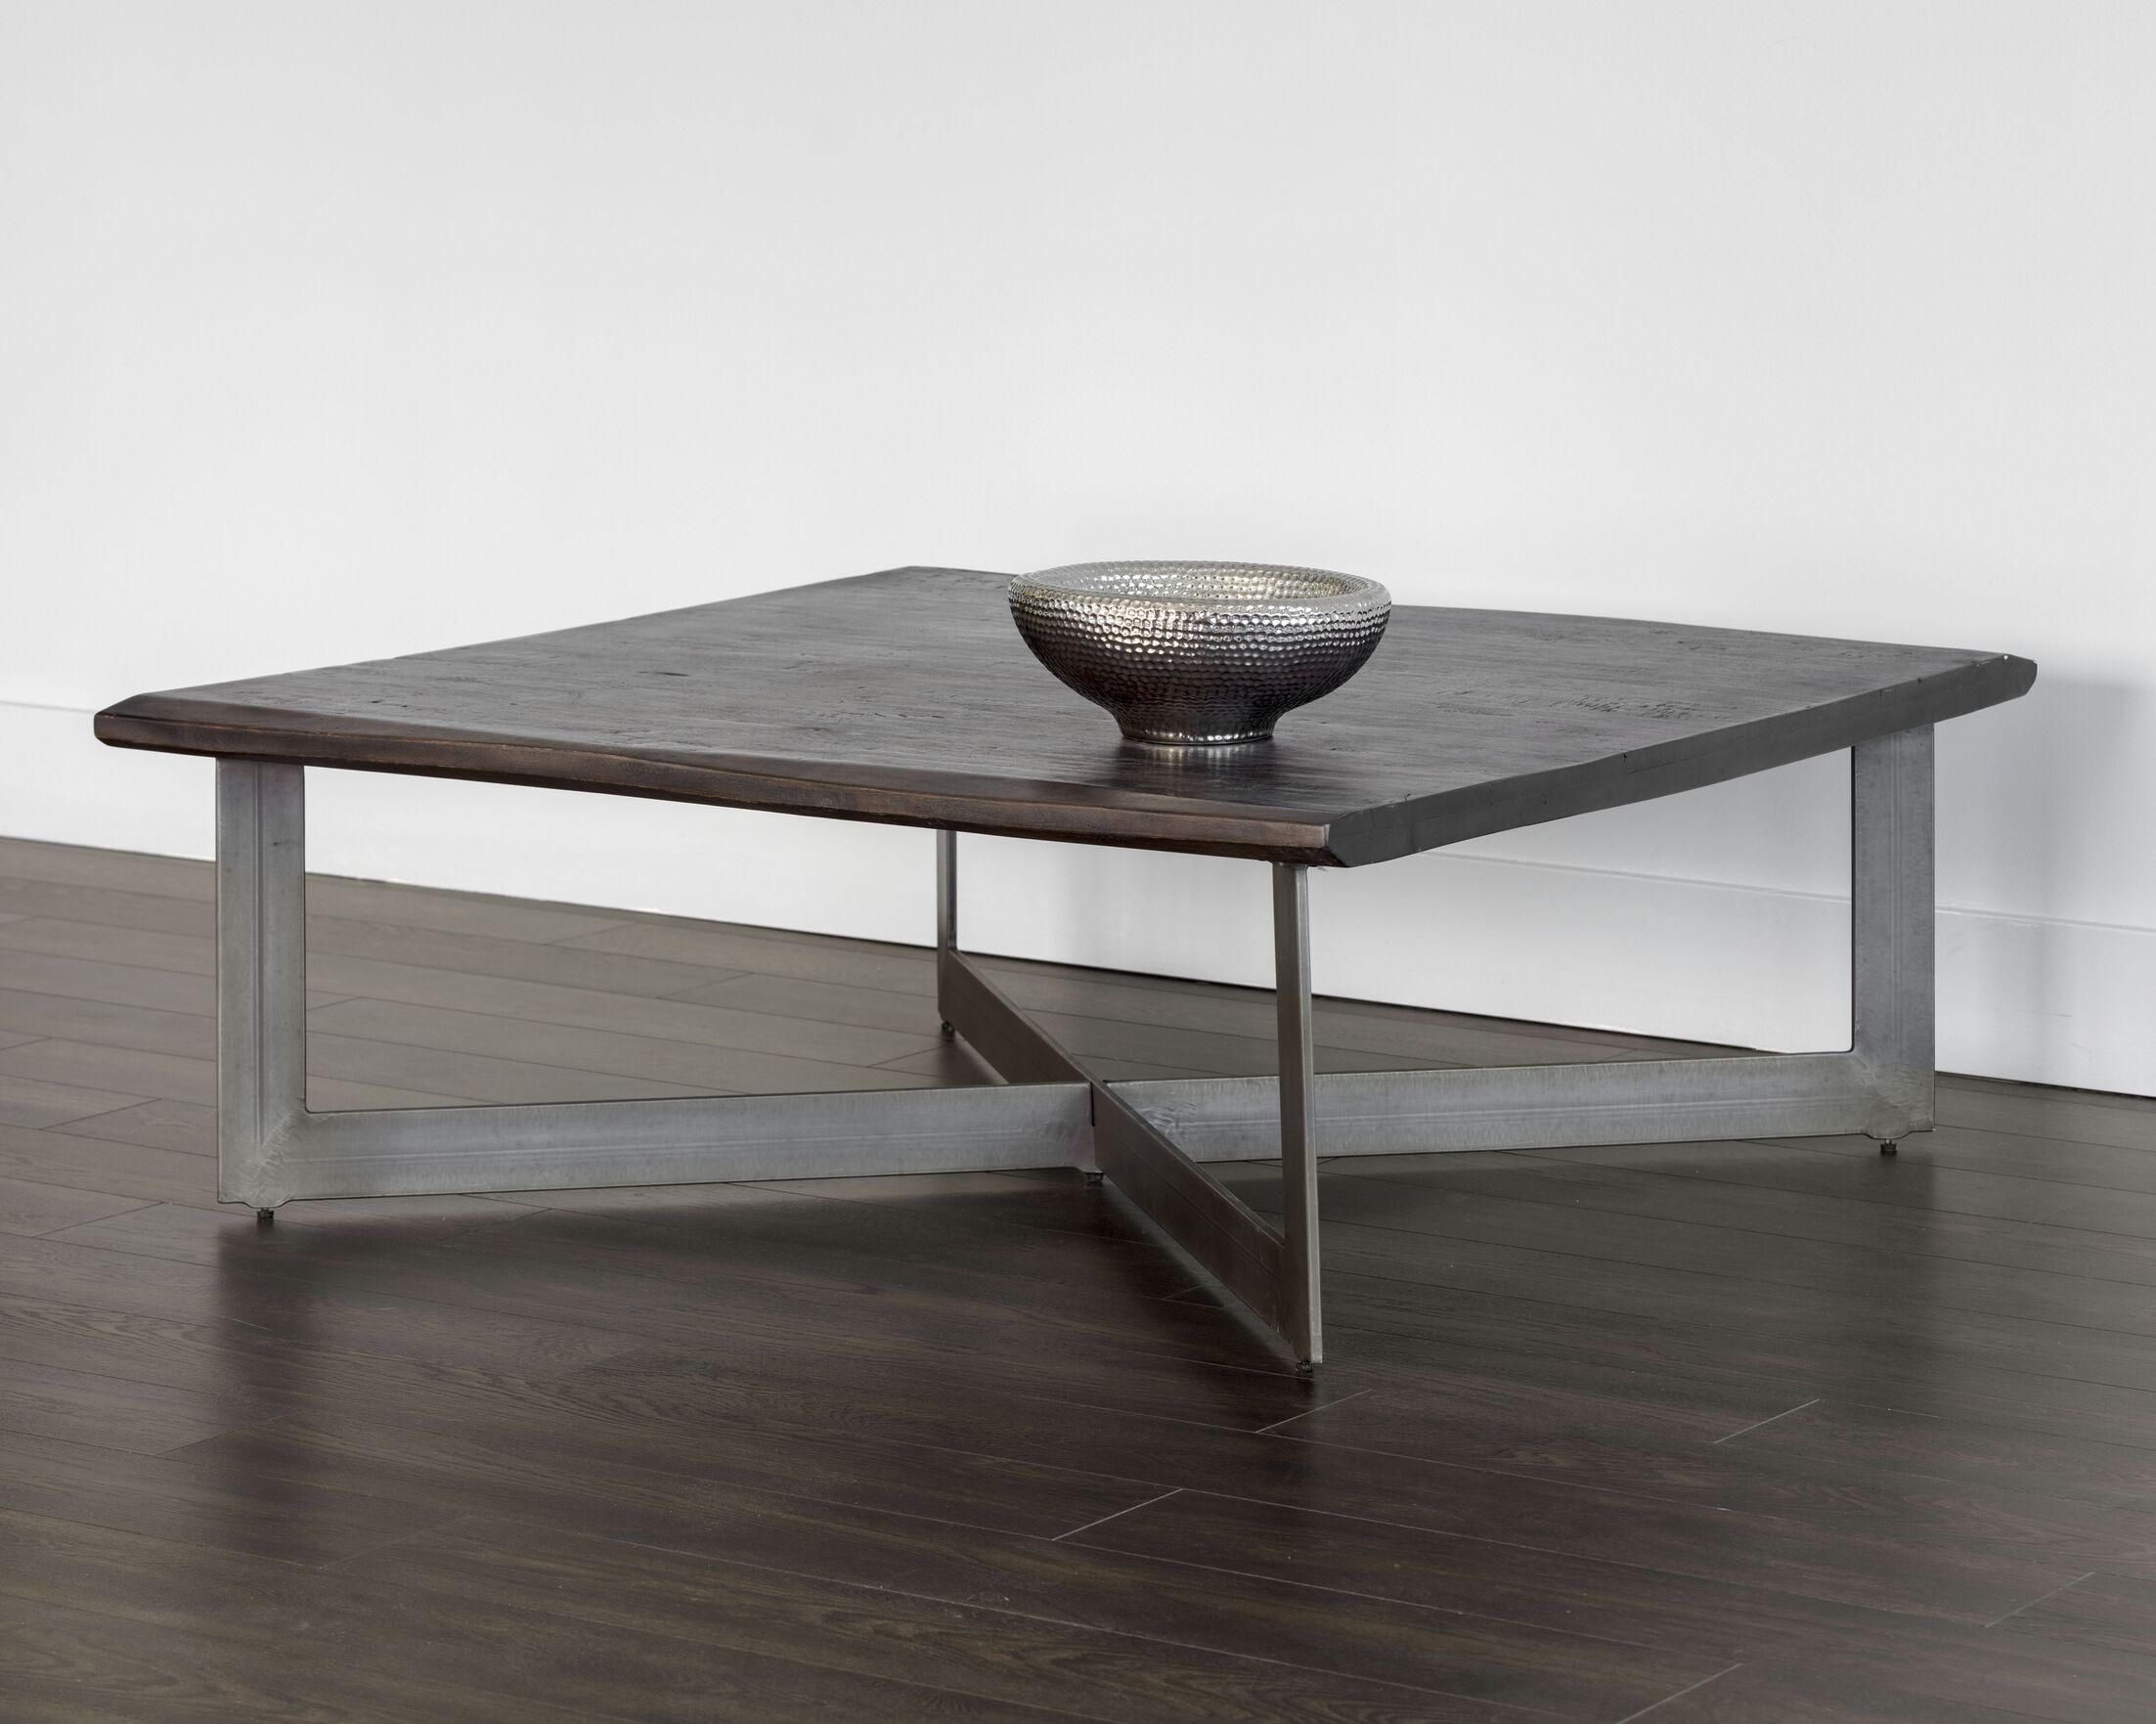 Marley Coffee Table